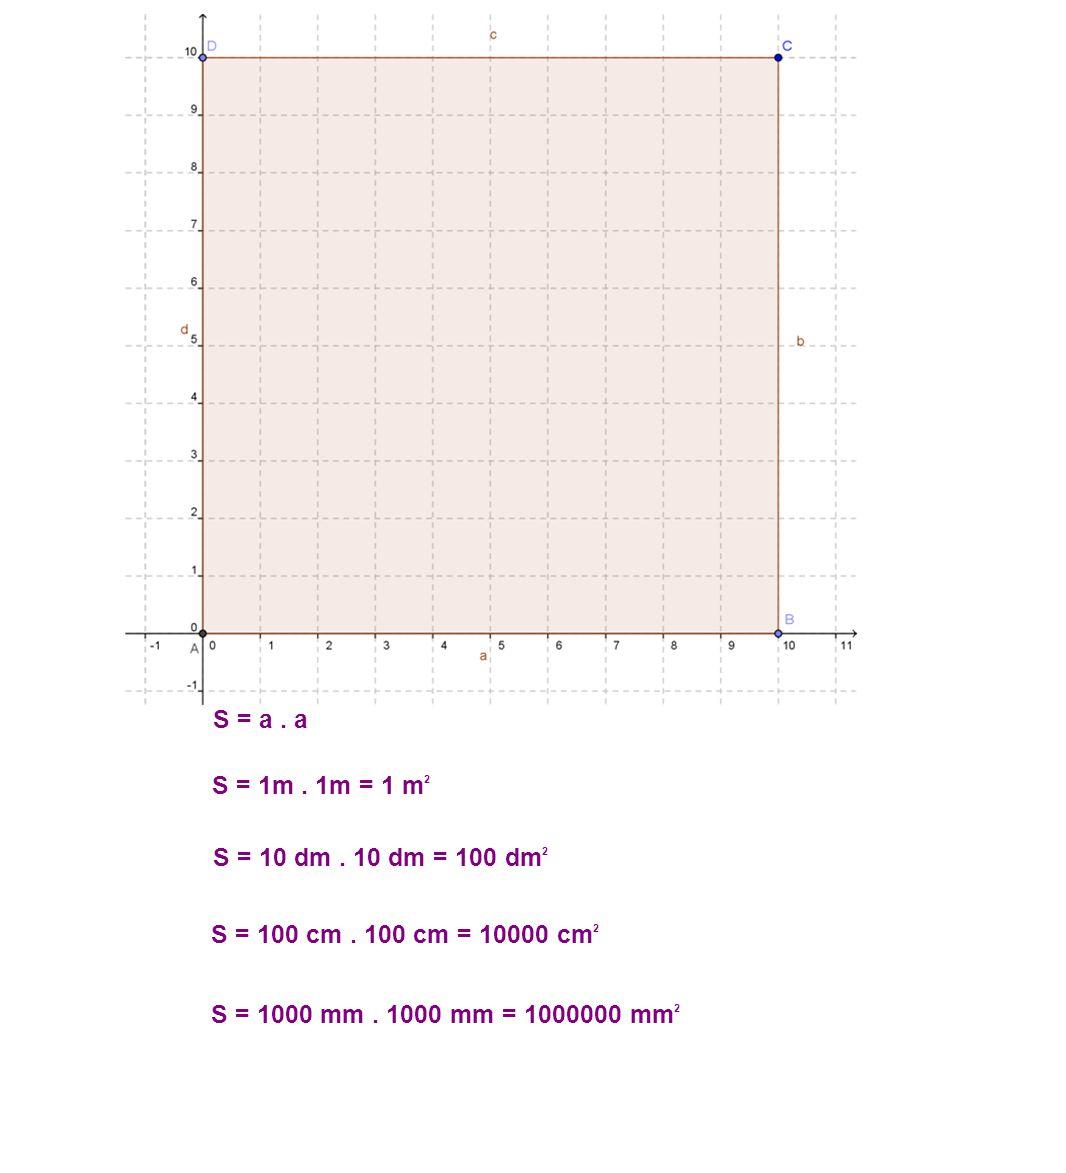 S = a. a S = 1m. 1m = 1 m 2 S = 10 dm. 10 dm = 100 dm 2 S = 100 cm. 100 cm = 10000 cm 2 S = 1000 mm. 1000 mm = 1000000 mm 2